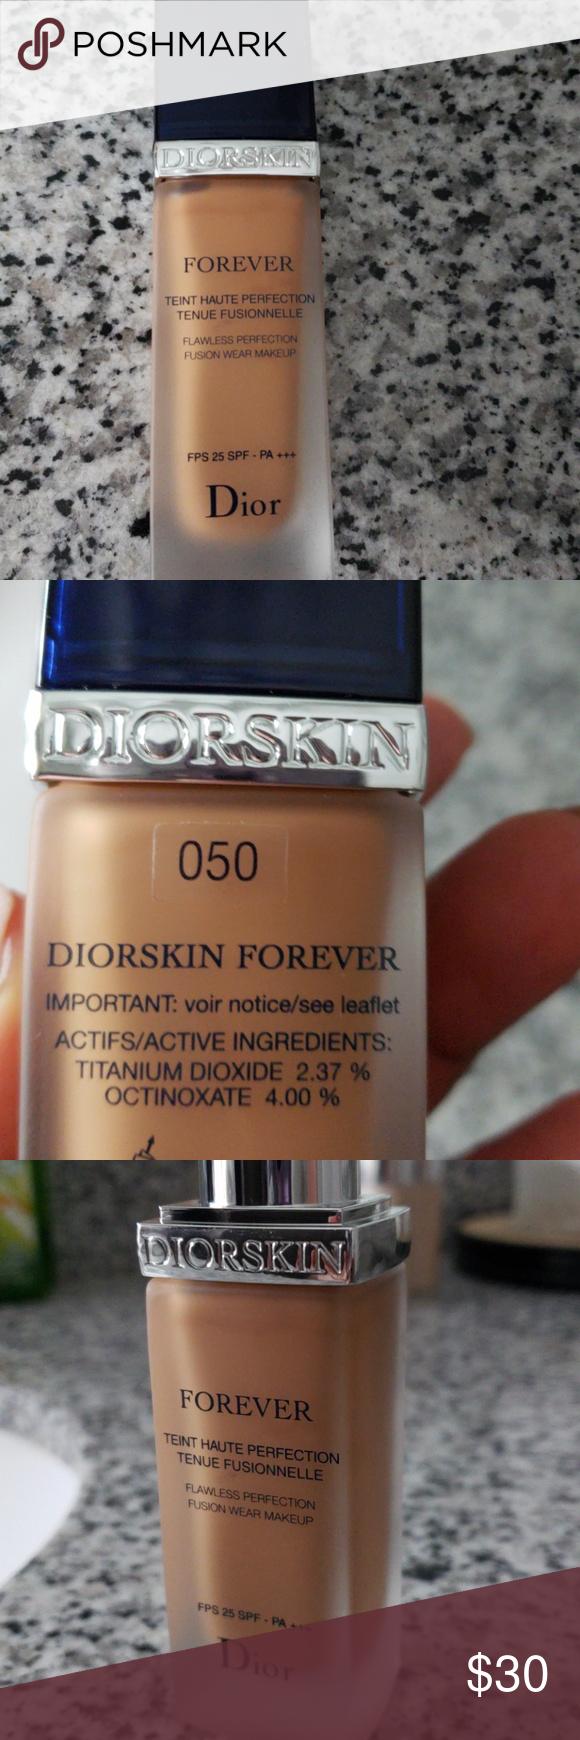 Diorskin Forever foundation Dior makeup foundation